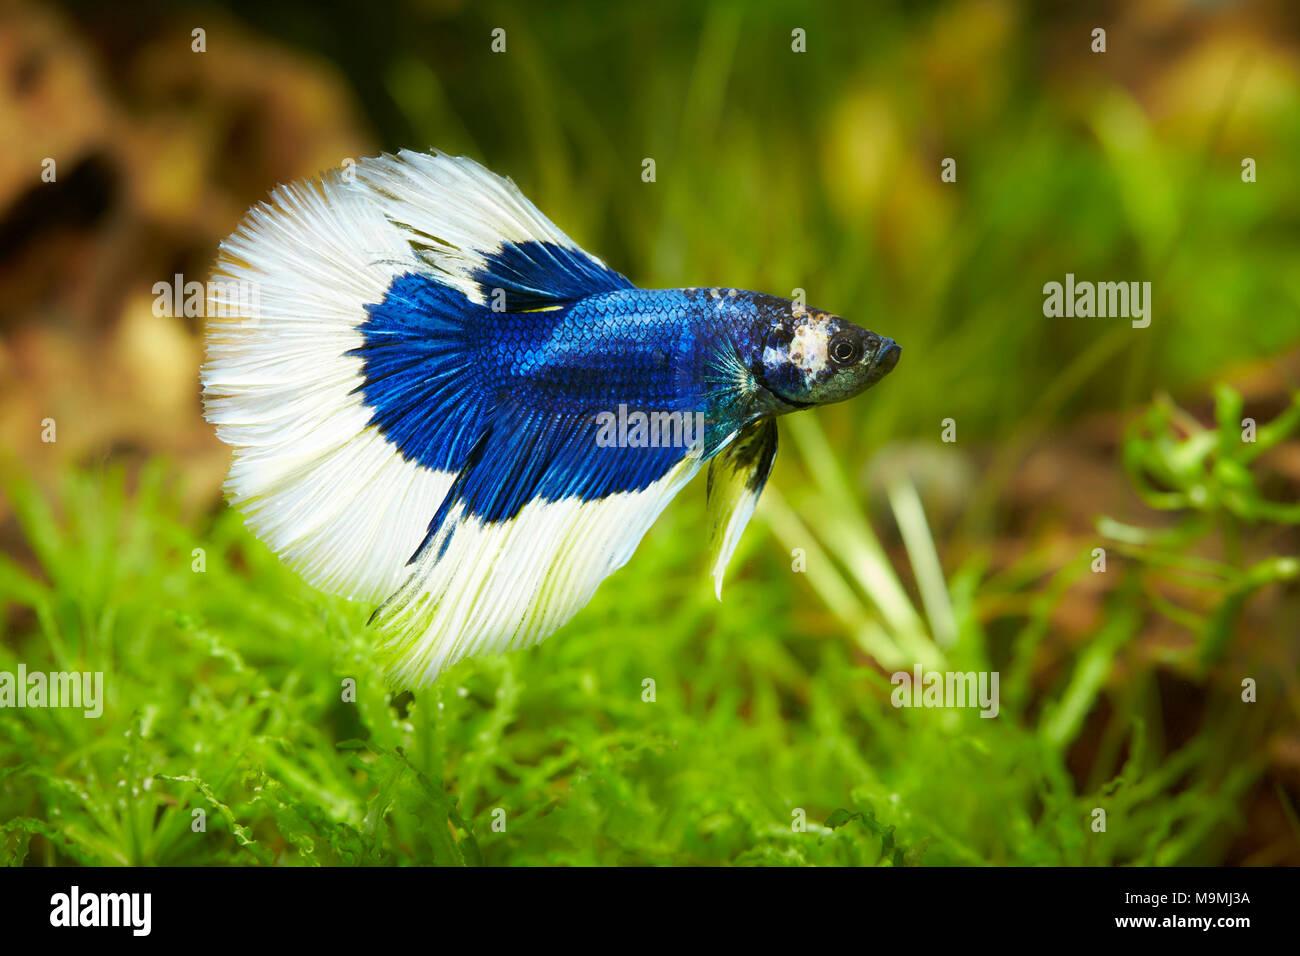 Siamese Fighting Fish (Betta splendens). Male in an aquarium. Germany. - Stock Image